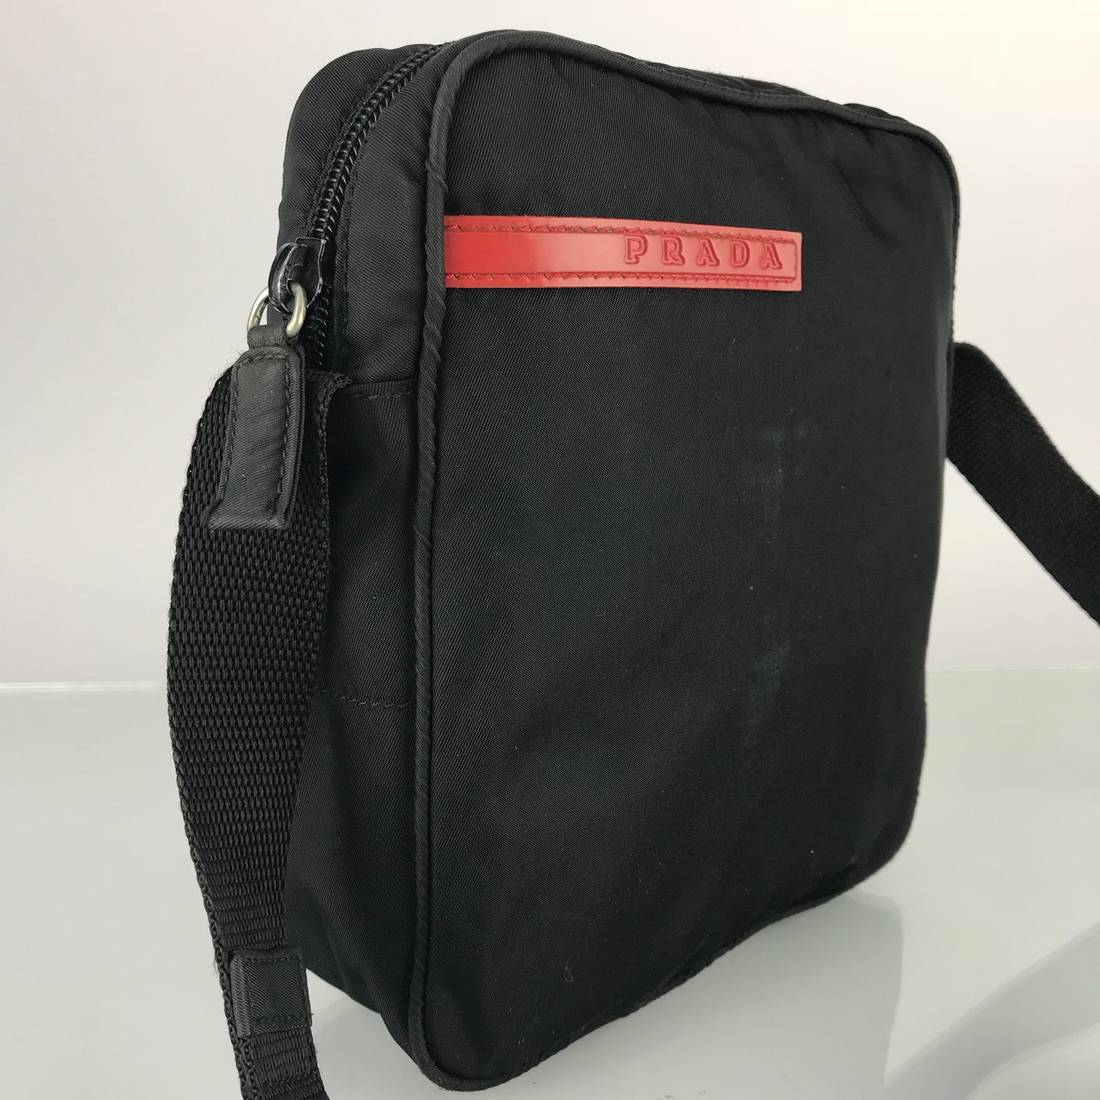 04d1e3bb02fa ... denmark prada authentic prada sport black nylon crossbody bag size one  size 4 3f9ff 22fc3